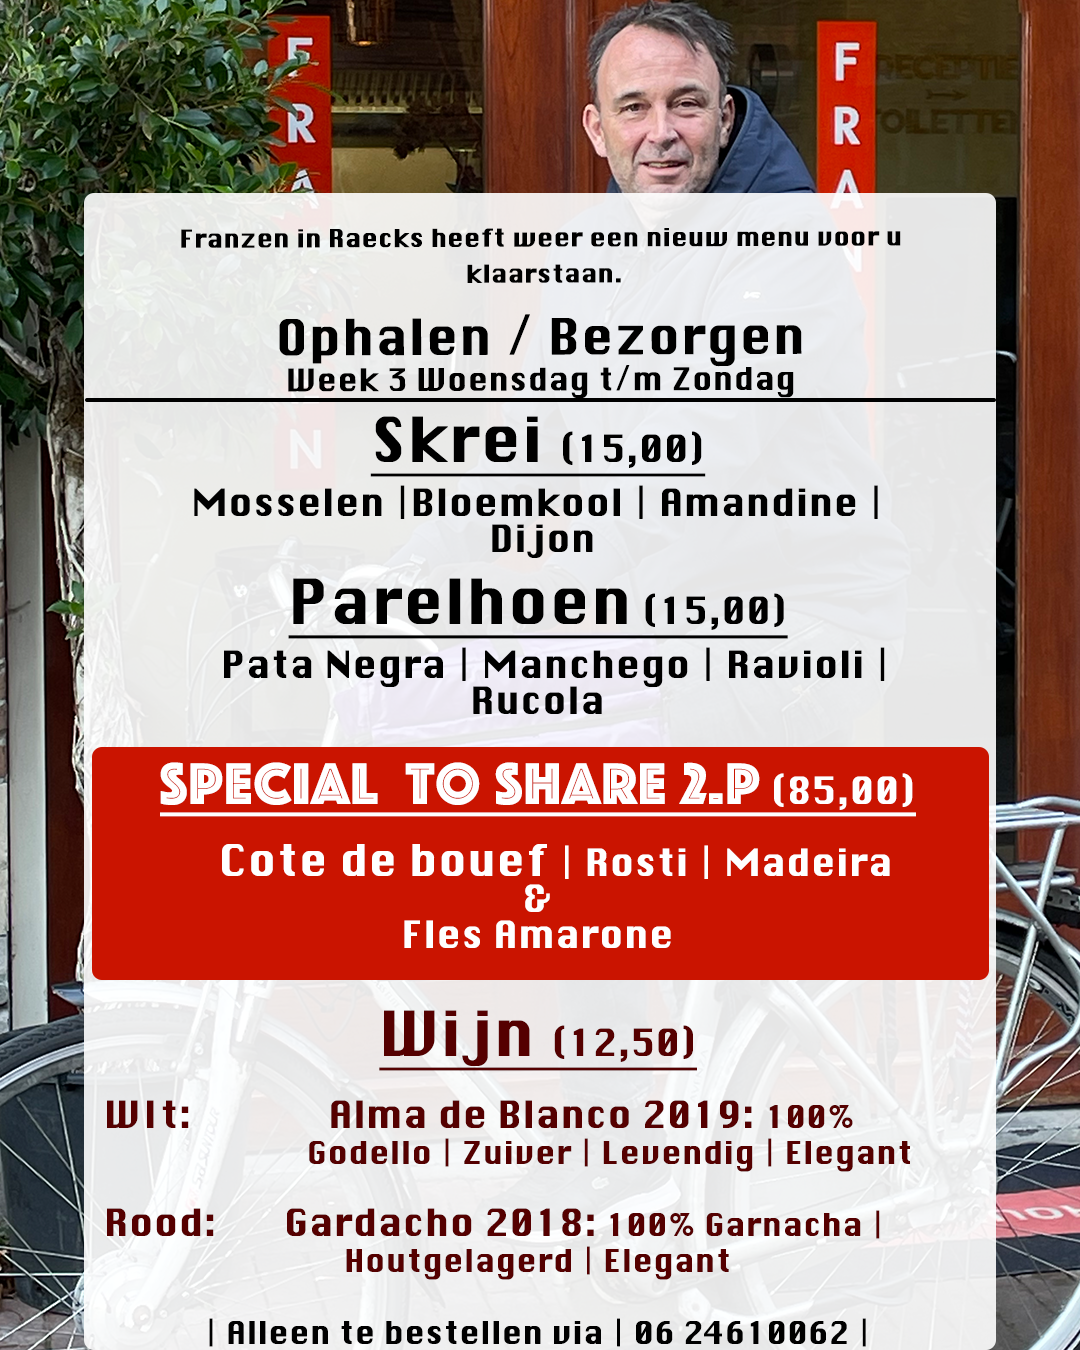 week 3 menu Restaurant Franzen